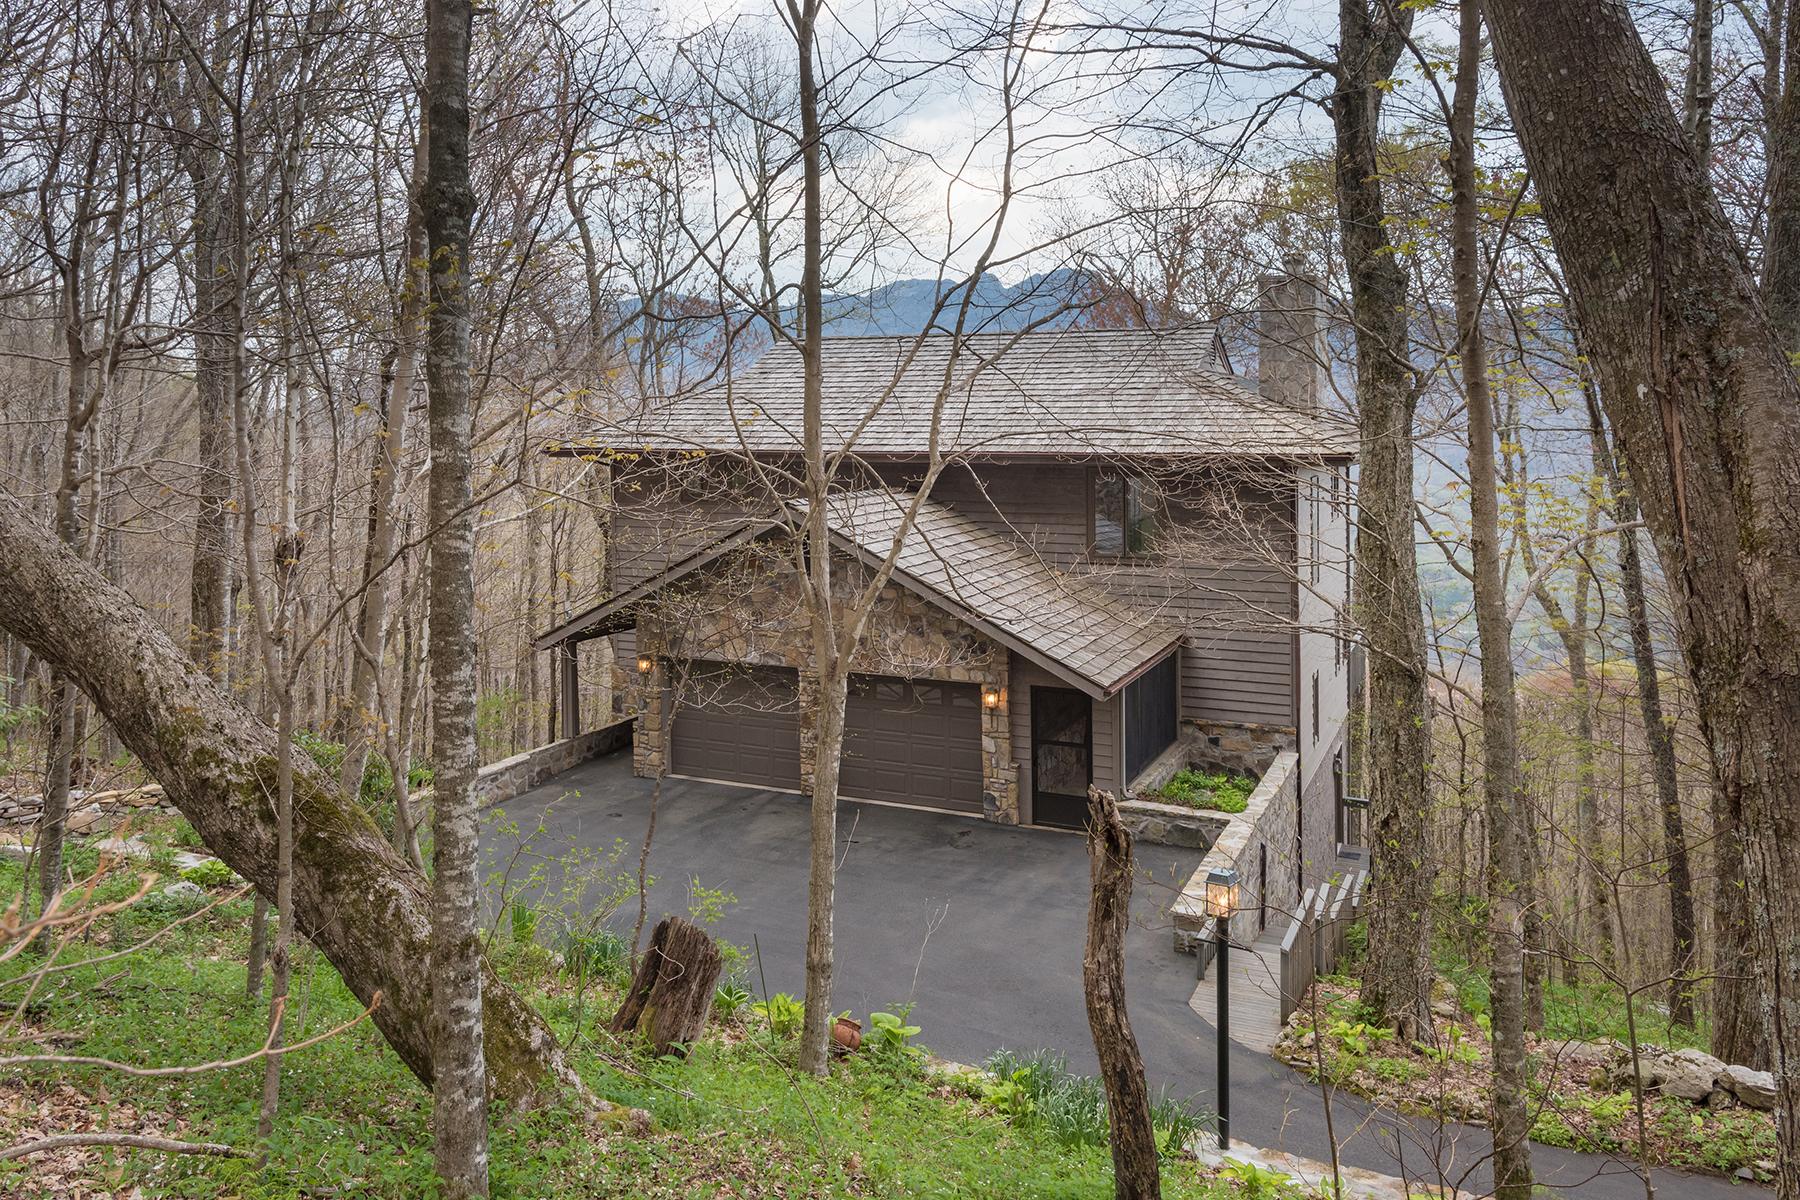 Single Family Home for Sale at LINVILLE RIDGE 213 Ridge Dr 2, Linville, North Carolina 28646 United States